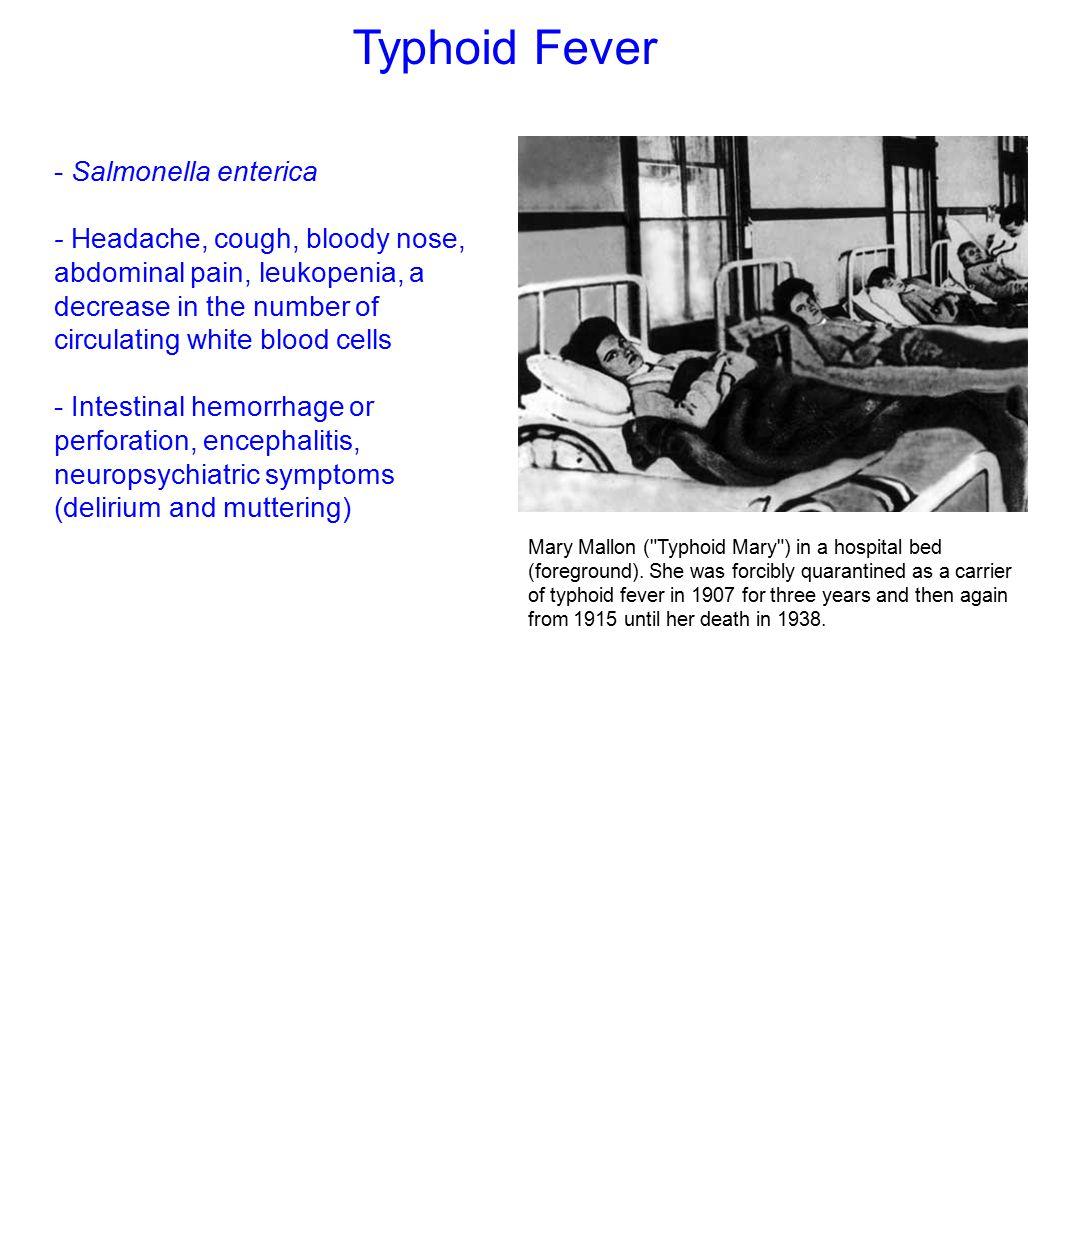 lipitor 80mg simvastatin 40mg hofh study